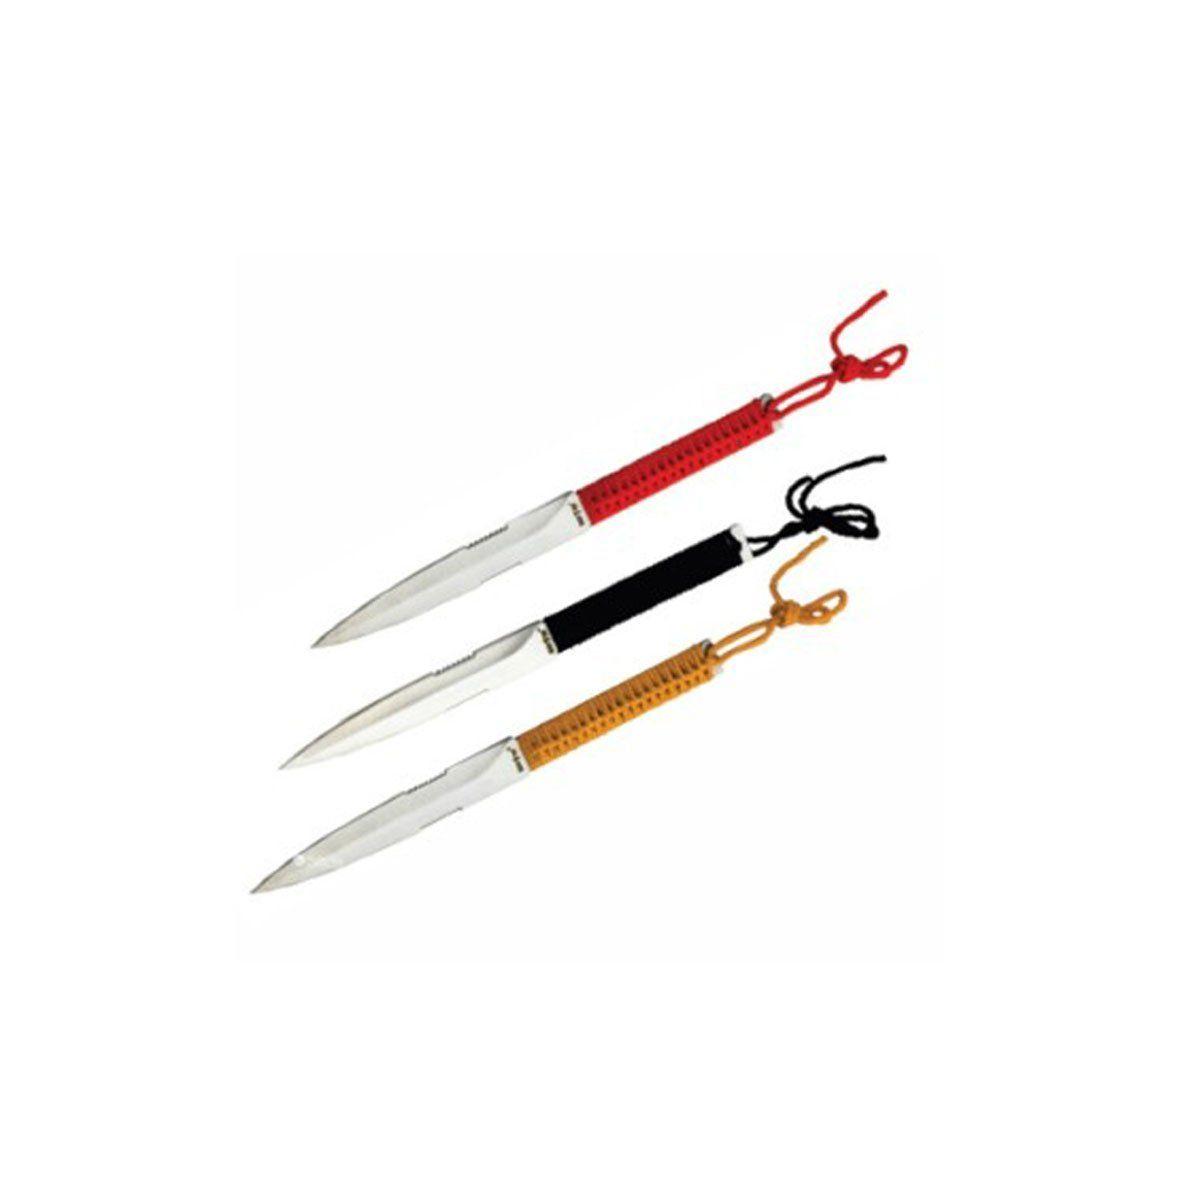 Kit Facas De Arremesso 11cm Inox c/ 3 facas